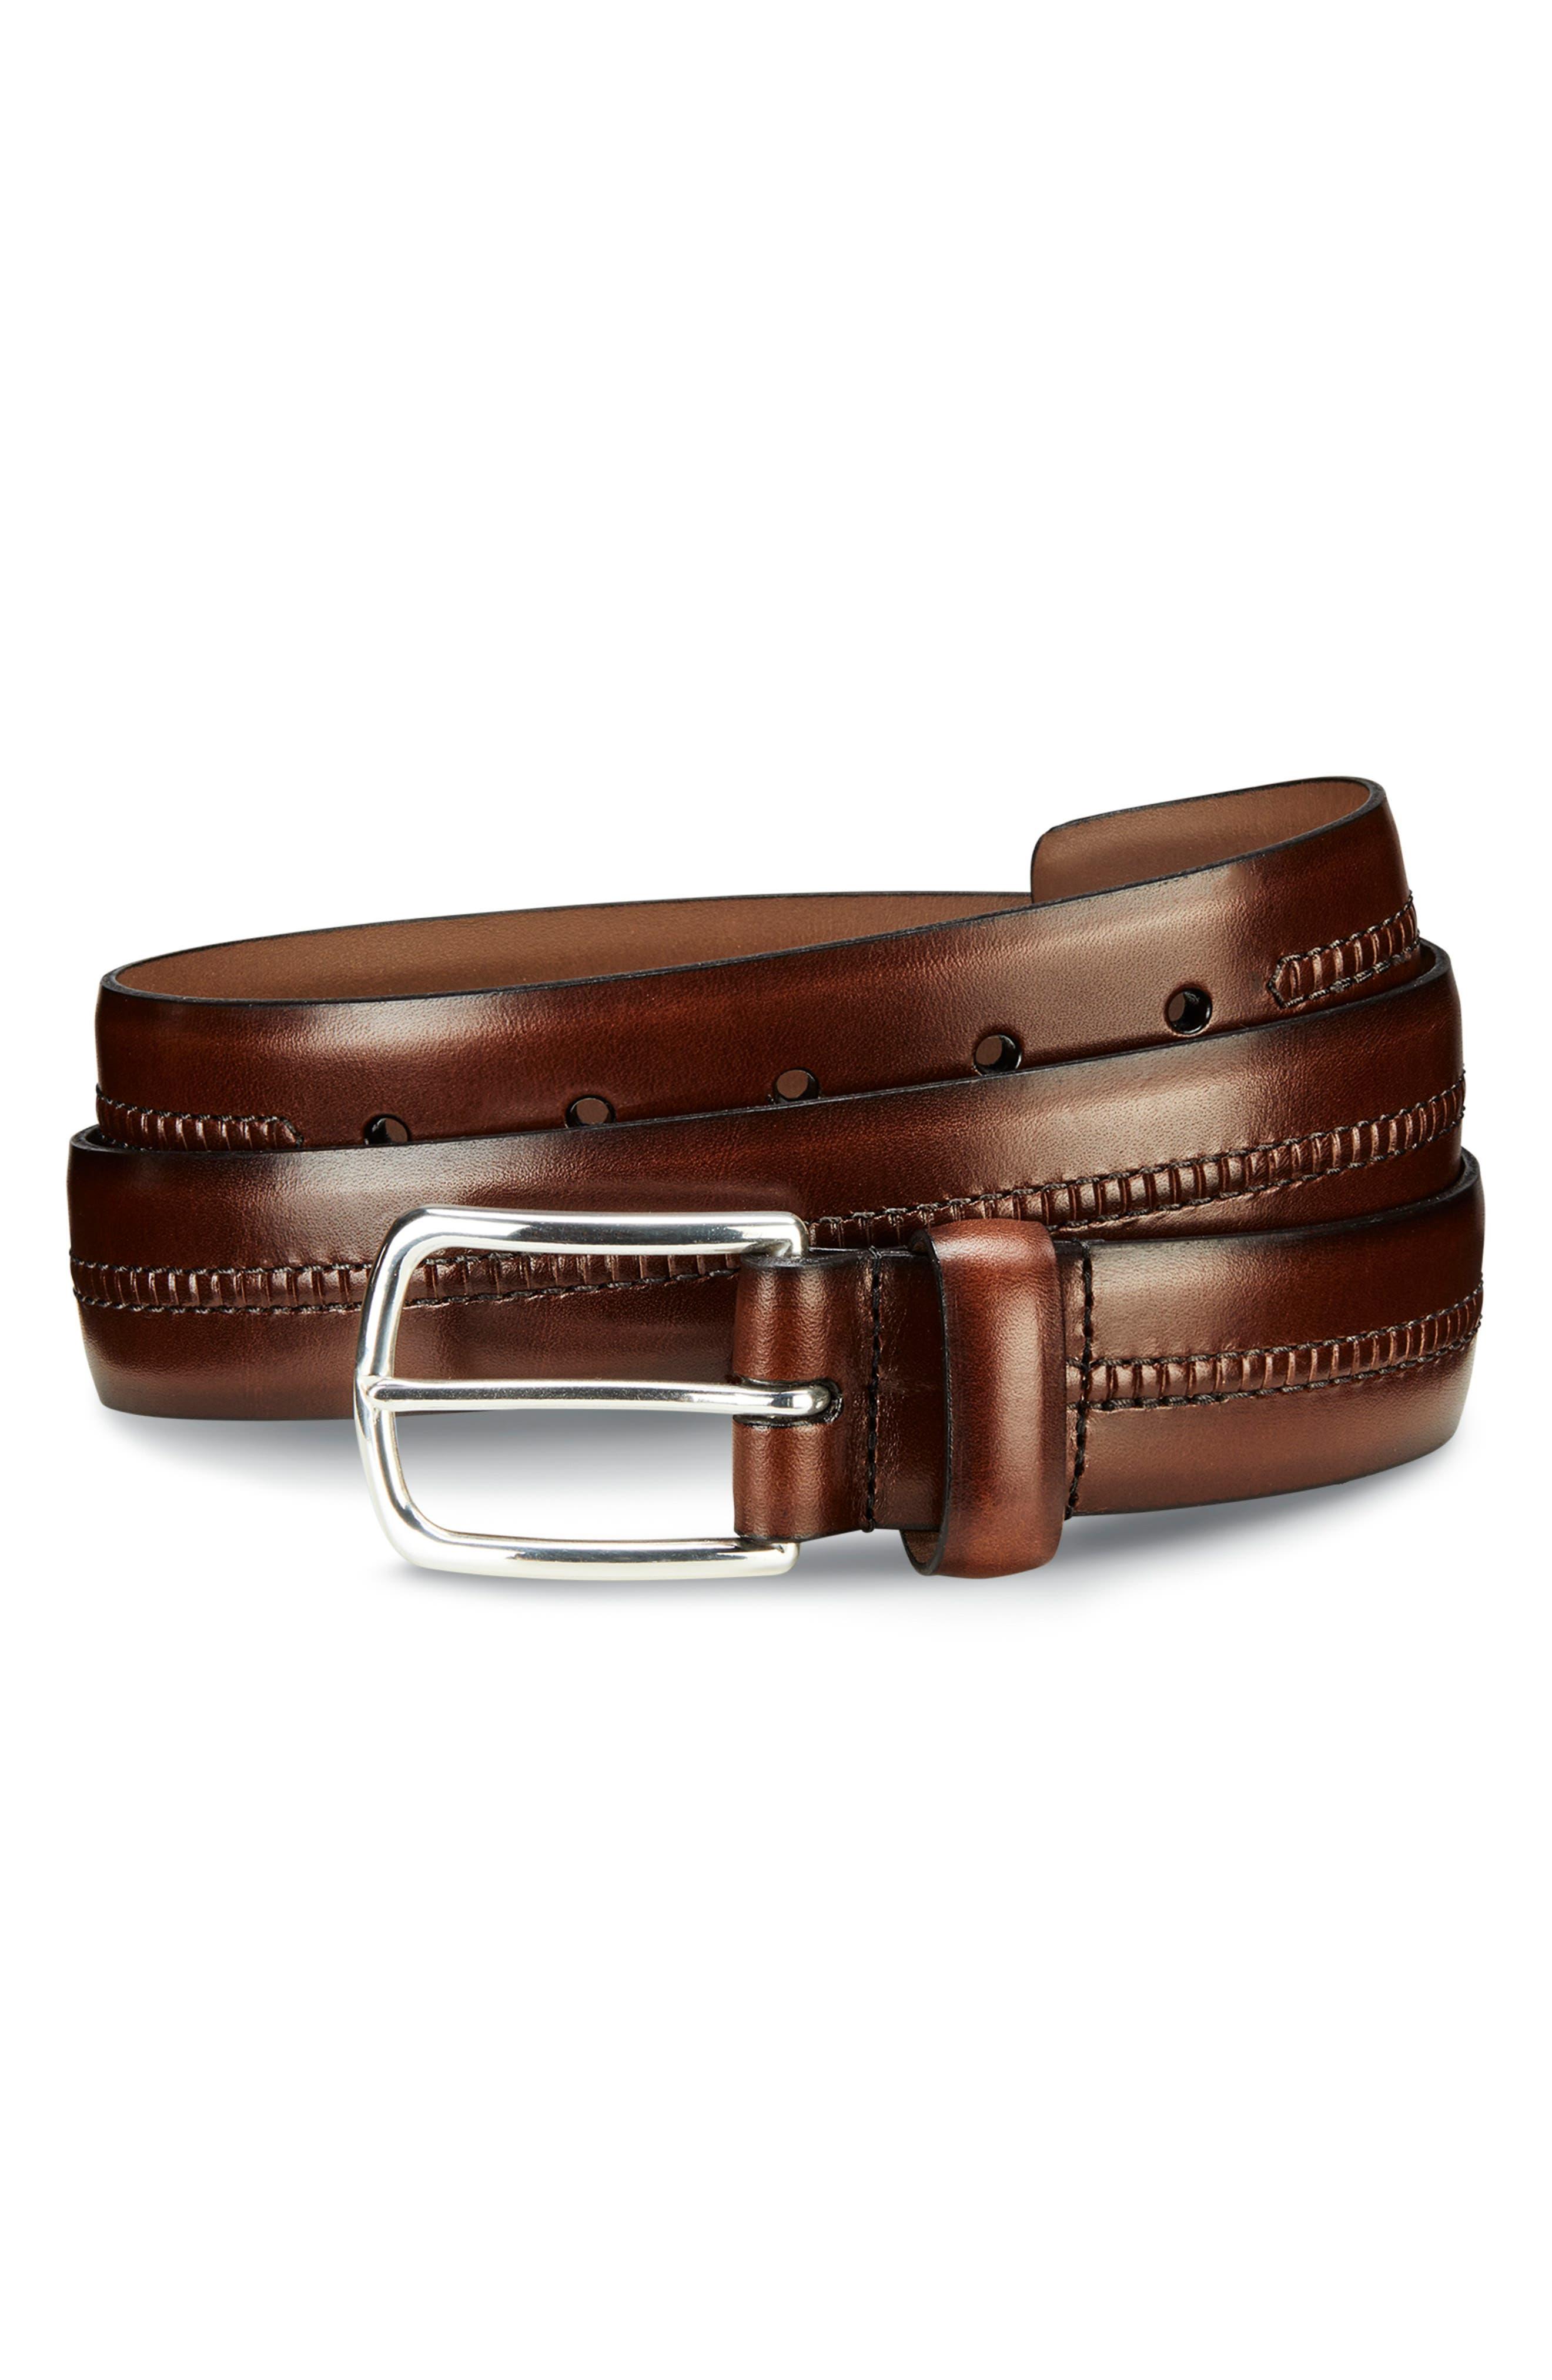 ALLEN EDMONDS Cambridge Ave Leather Belt, Main, color, BROWN BURNISHED